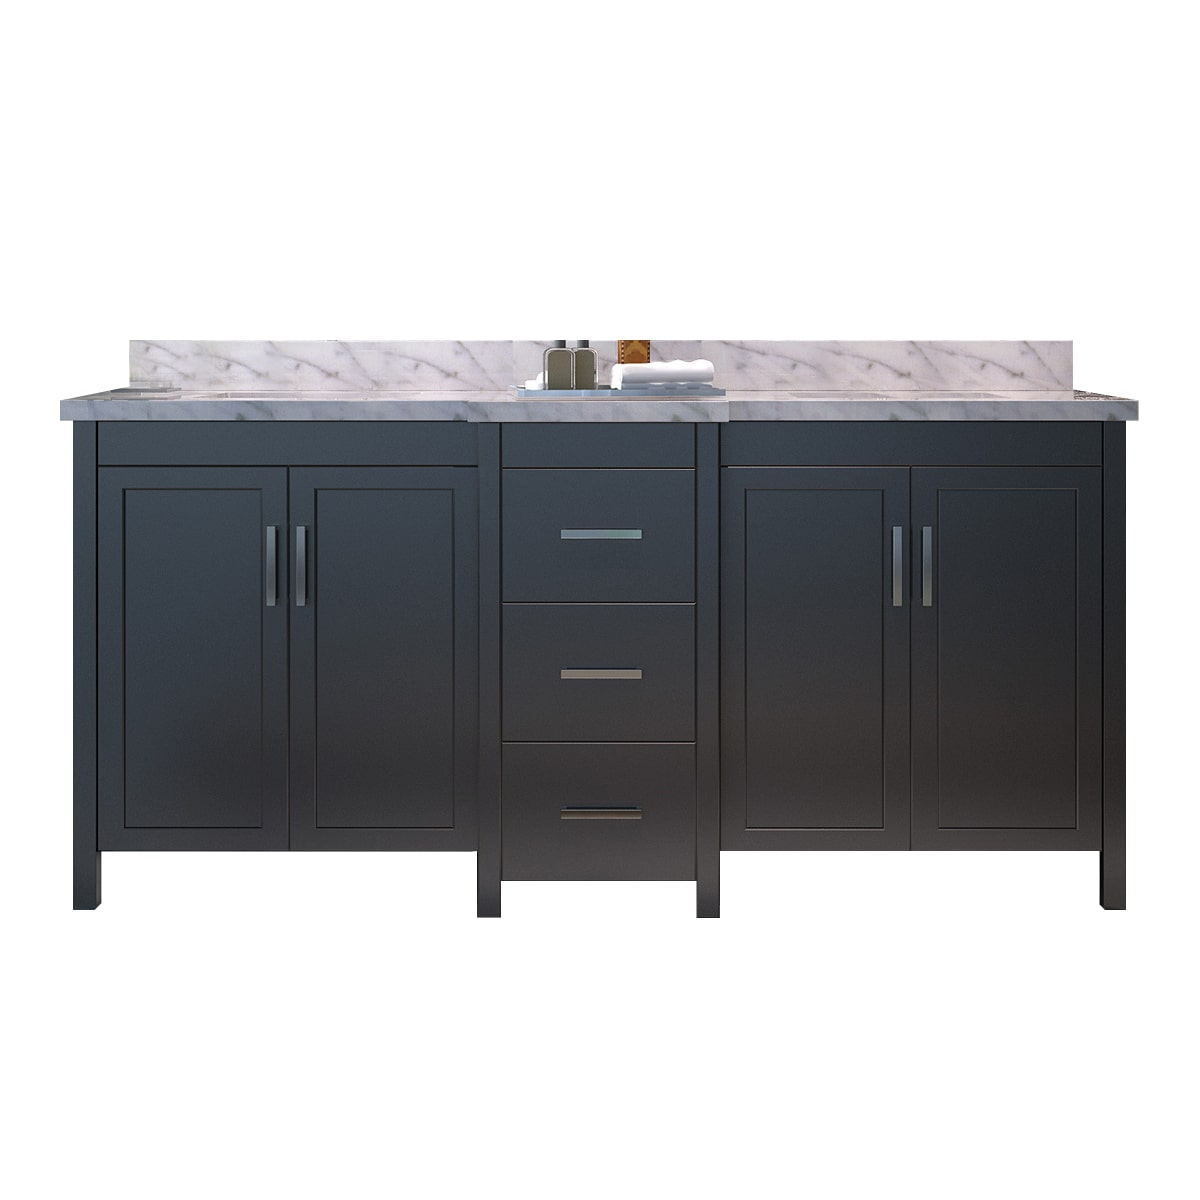 73 hollandale double sink set